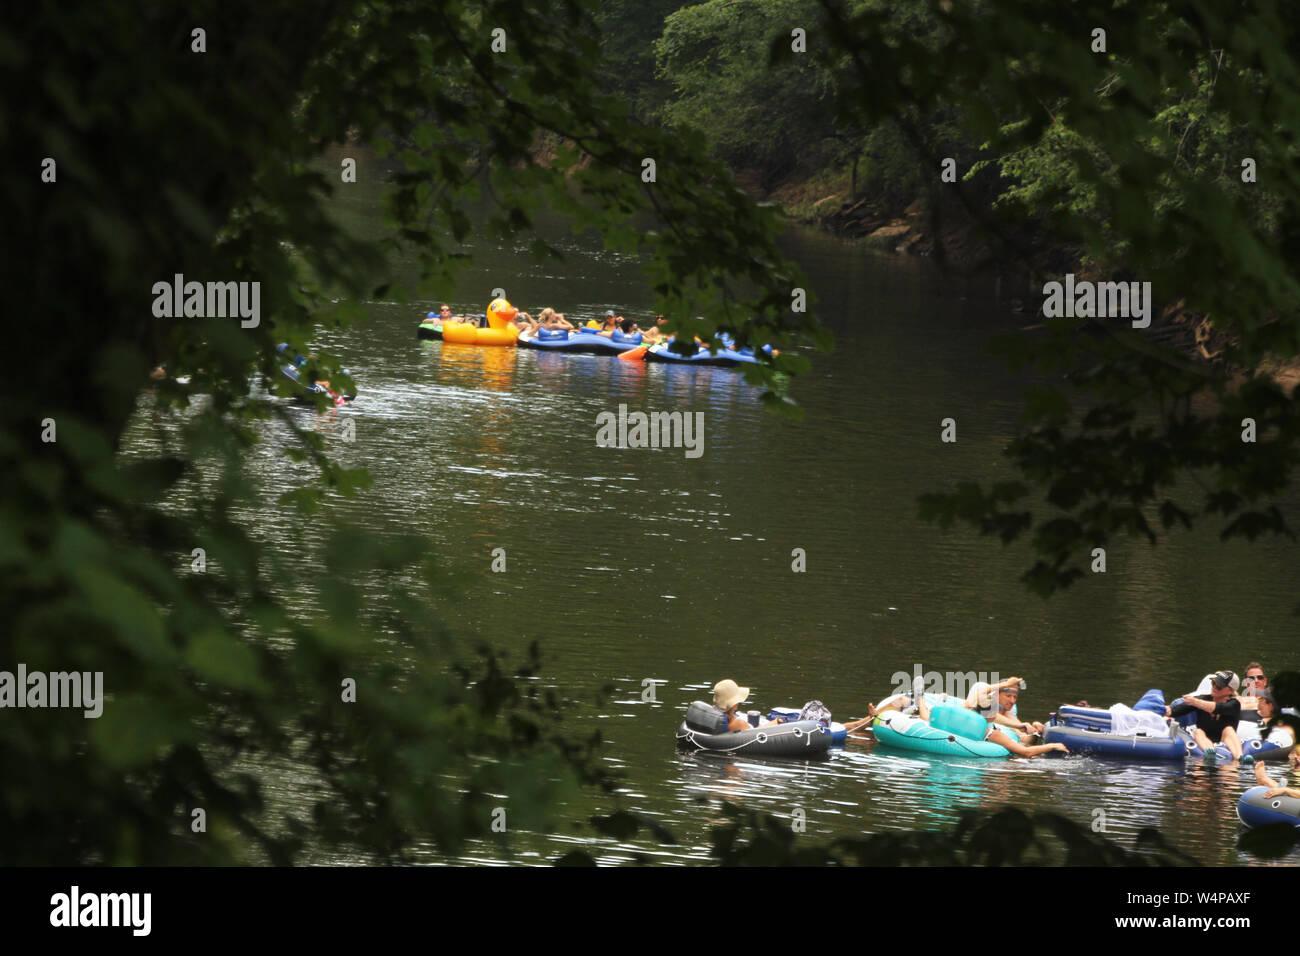 People tubing on Neuse River in North Carolina, USA Stock Photo